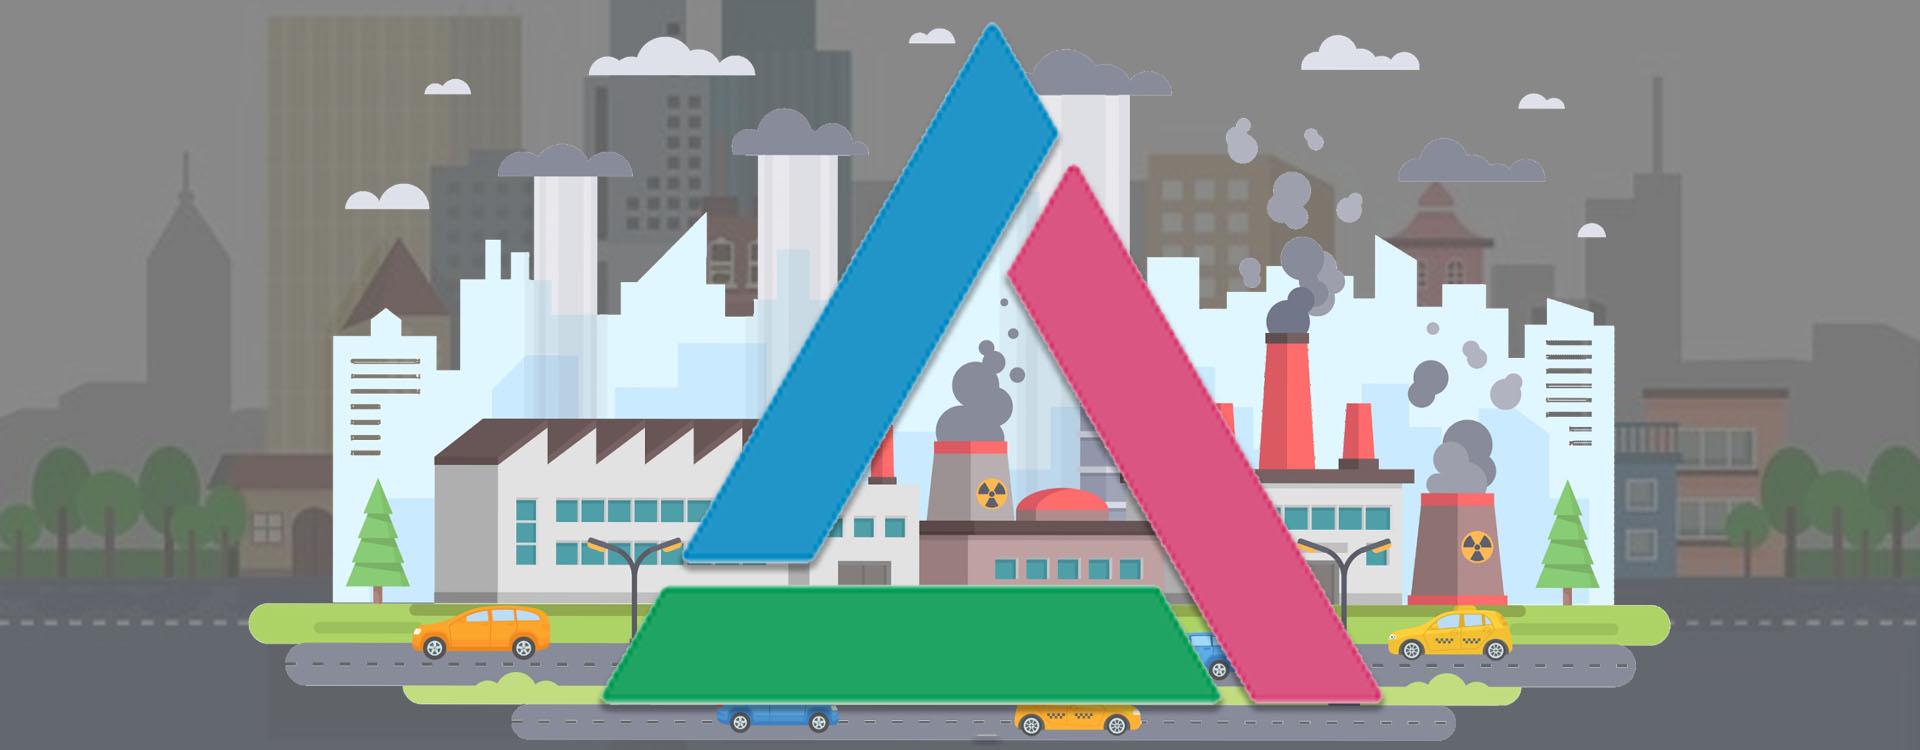 Ambee Determining Air Quality using AI